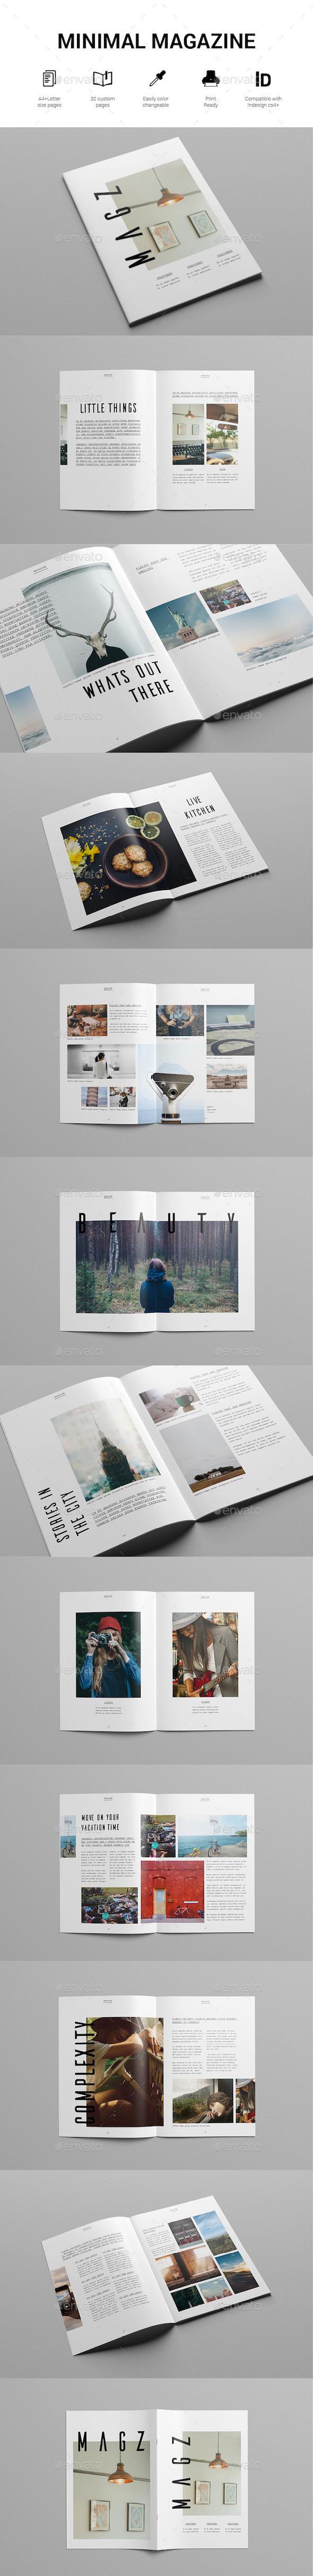 Minimal Lifestyle Magazine Template - Magazines Print Templates